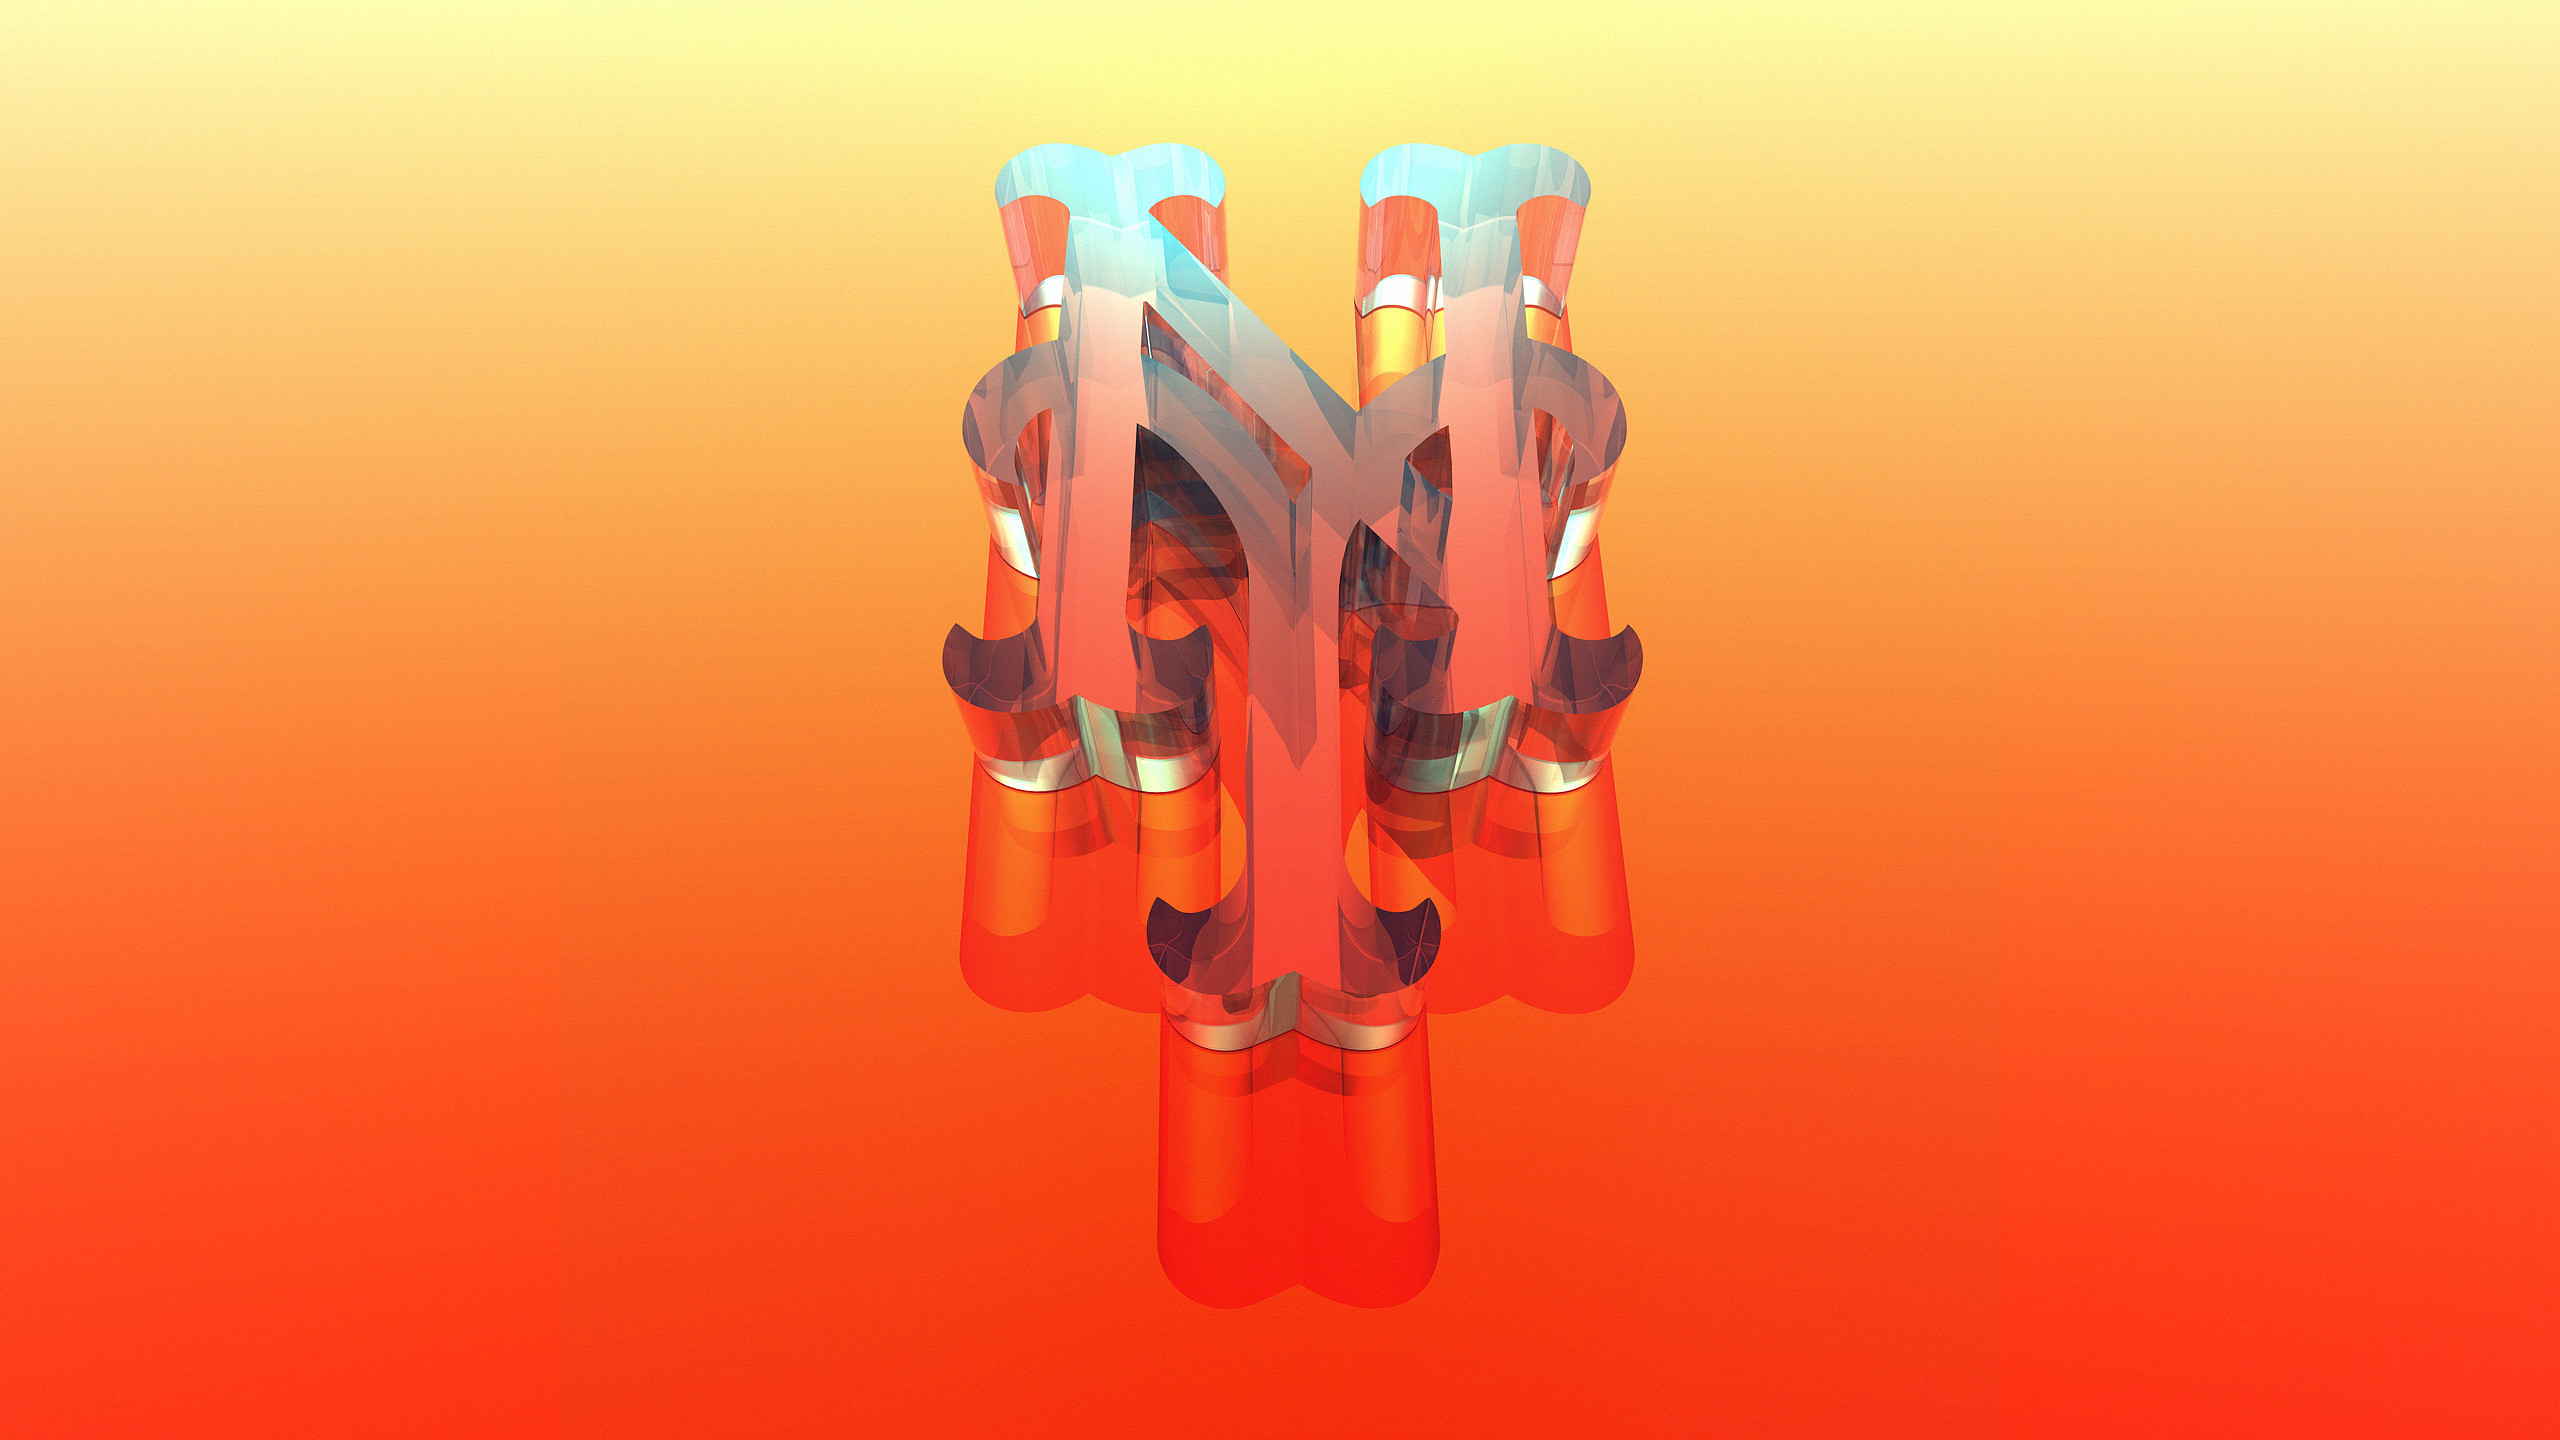 wallpaper.wiki-Mets-Desktop-Backgrounds-PIC-WPE004530